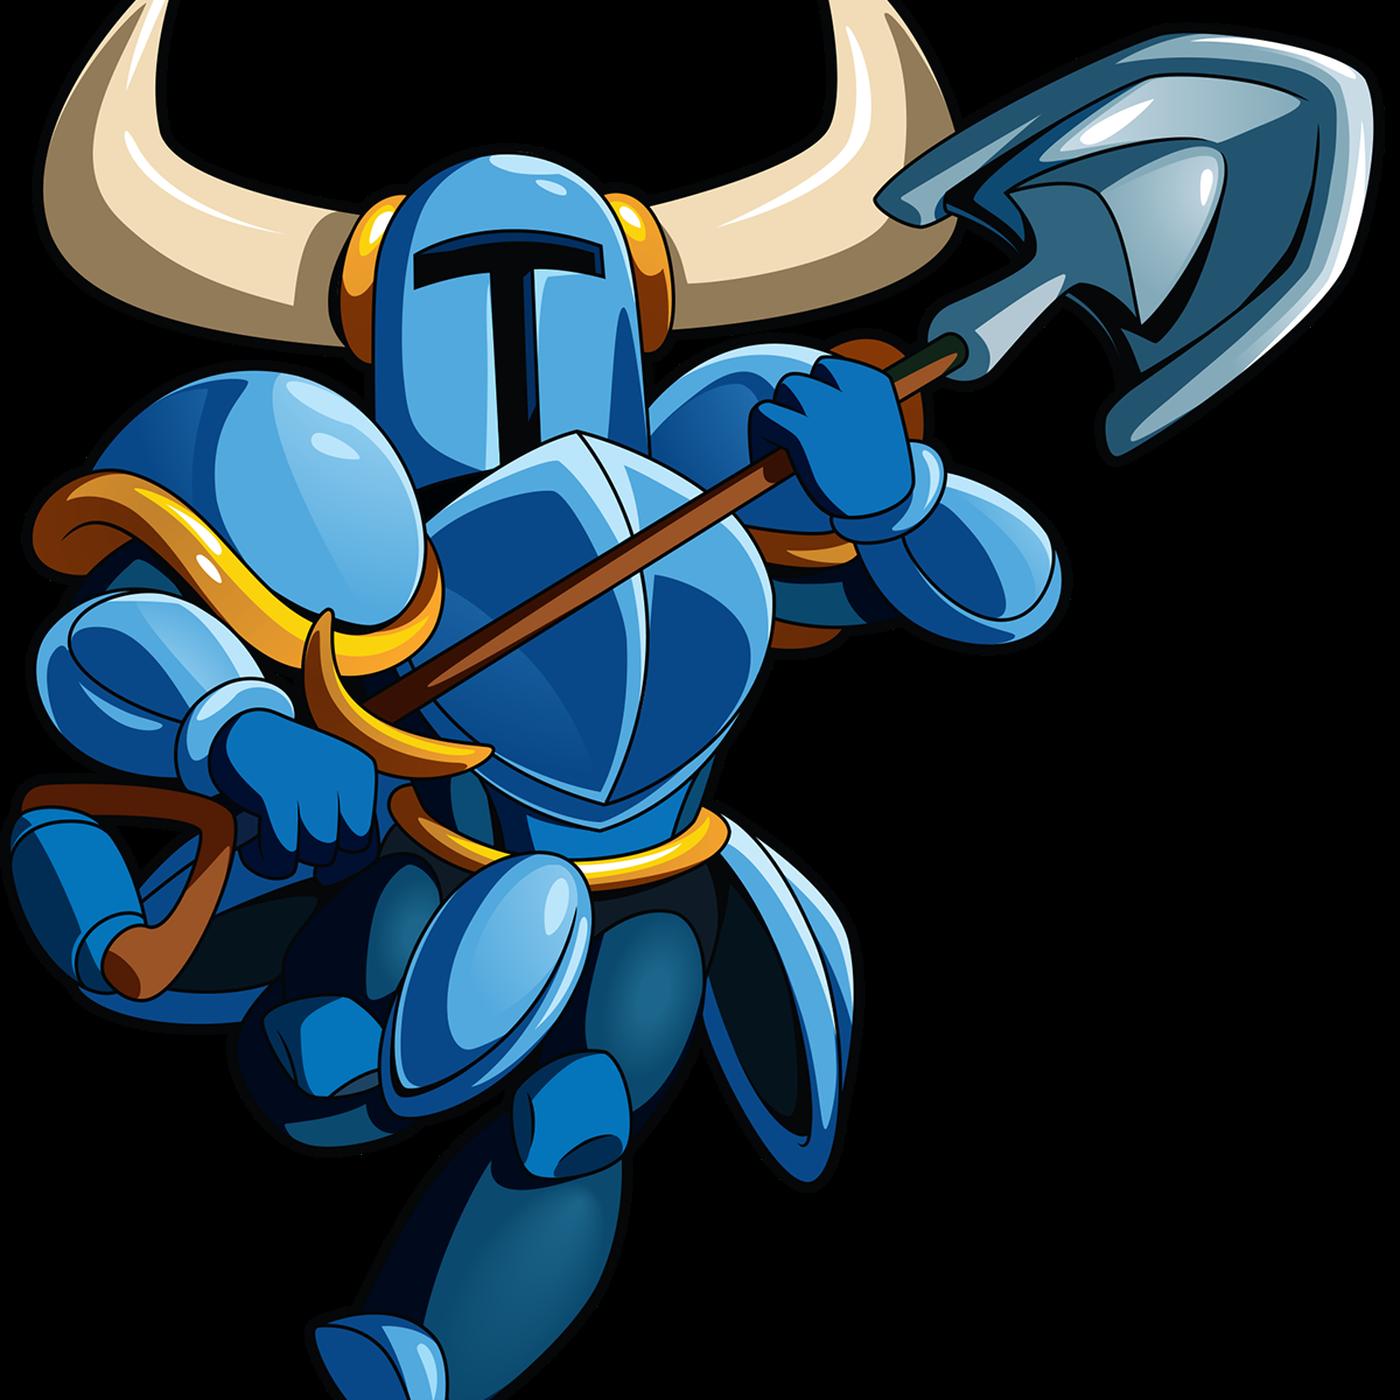 Shovel knight clipart graphic freeuse stock The making of Shovel Knight - Polygon graphic freeuse stock